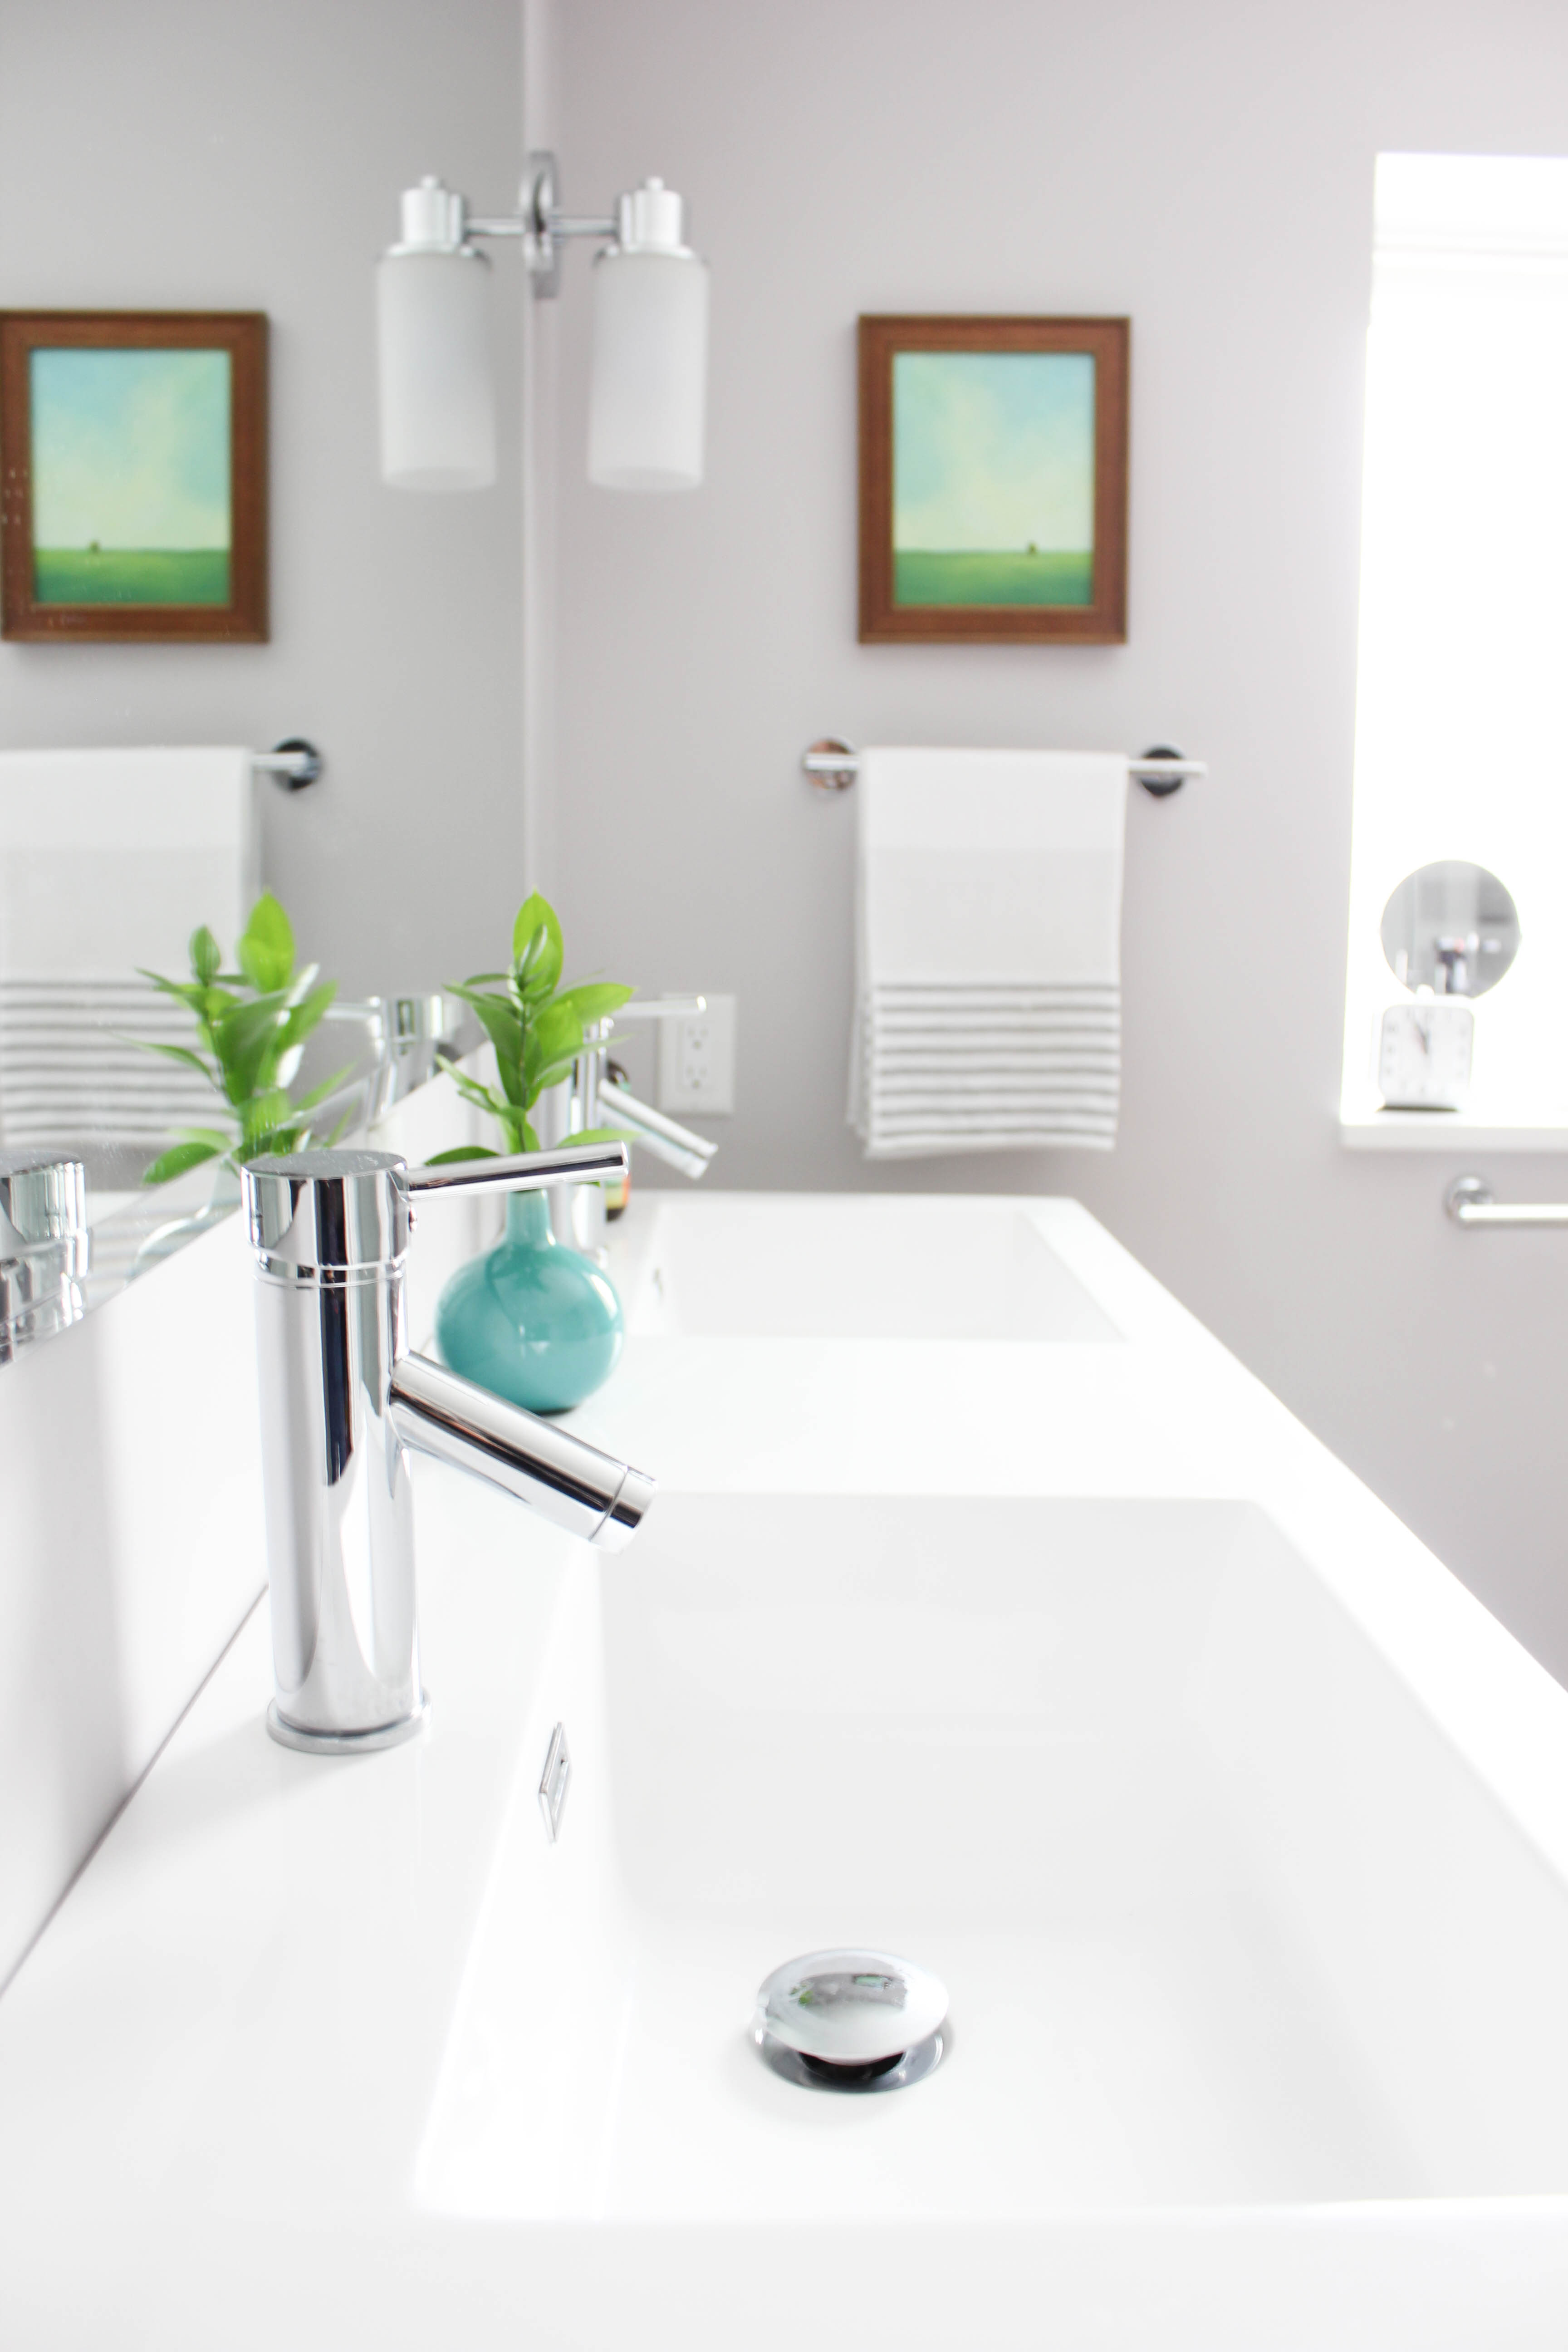 Basement Bathroom Remodel - Vanity Close-up